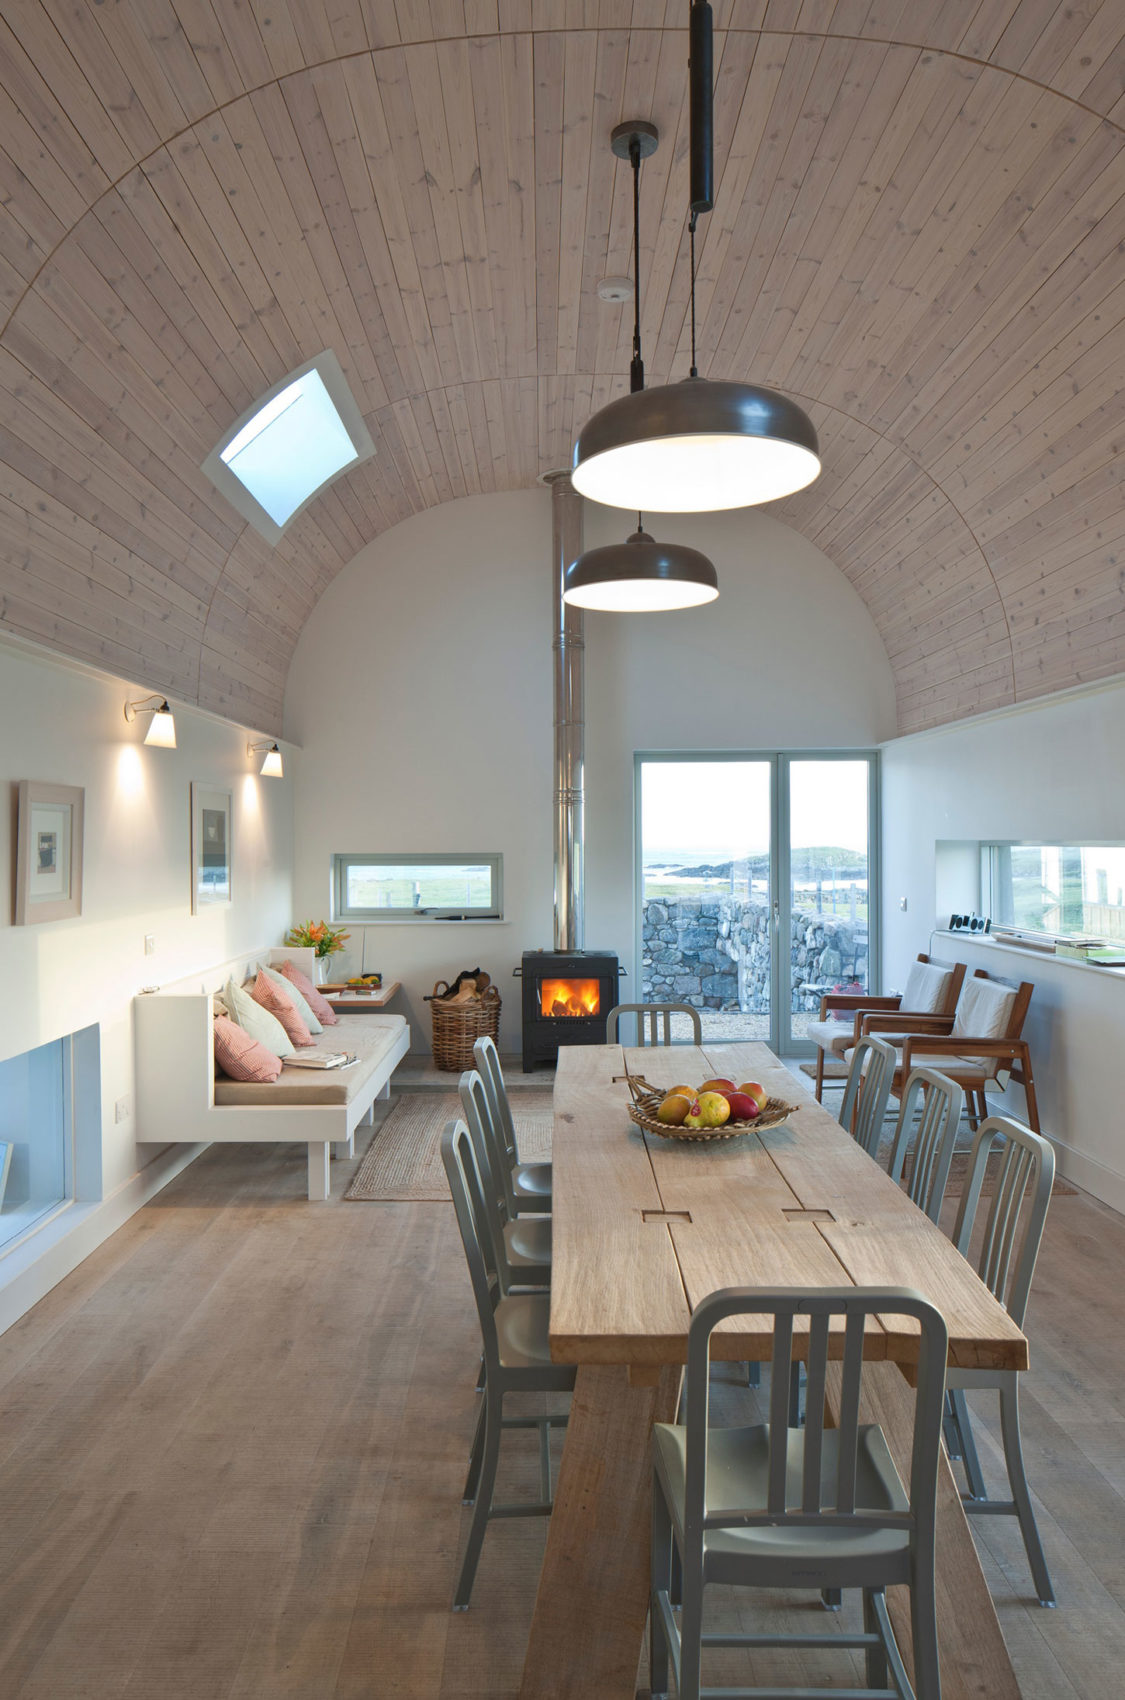 House Number 7 by Denizen Works (8)